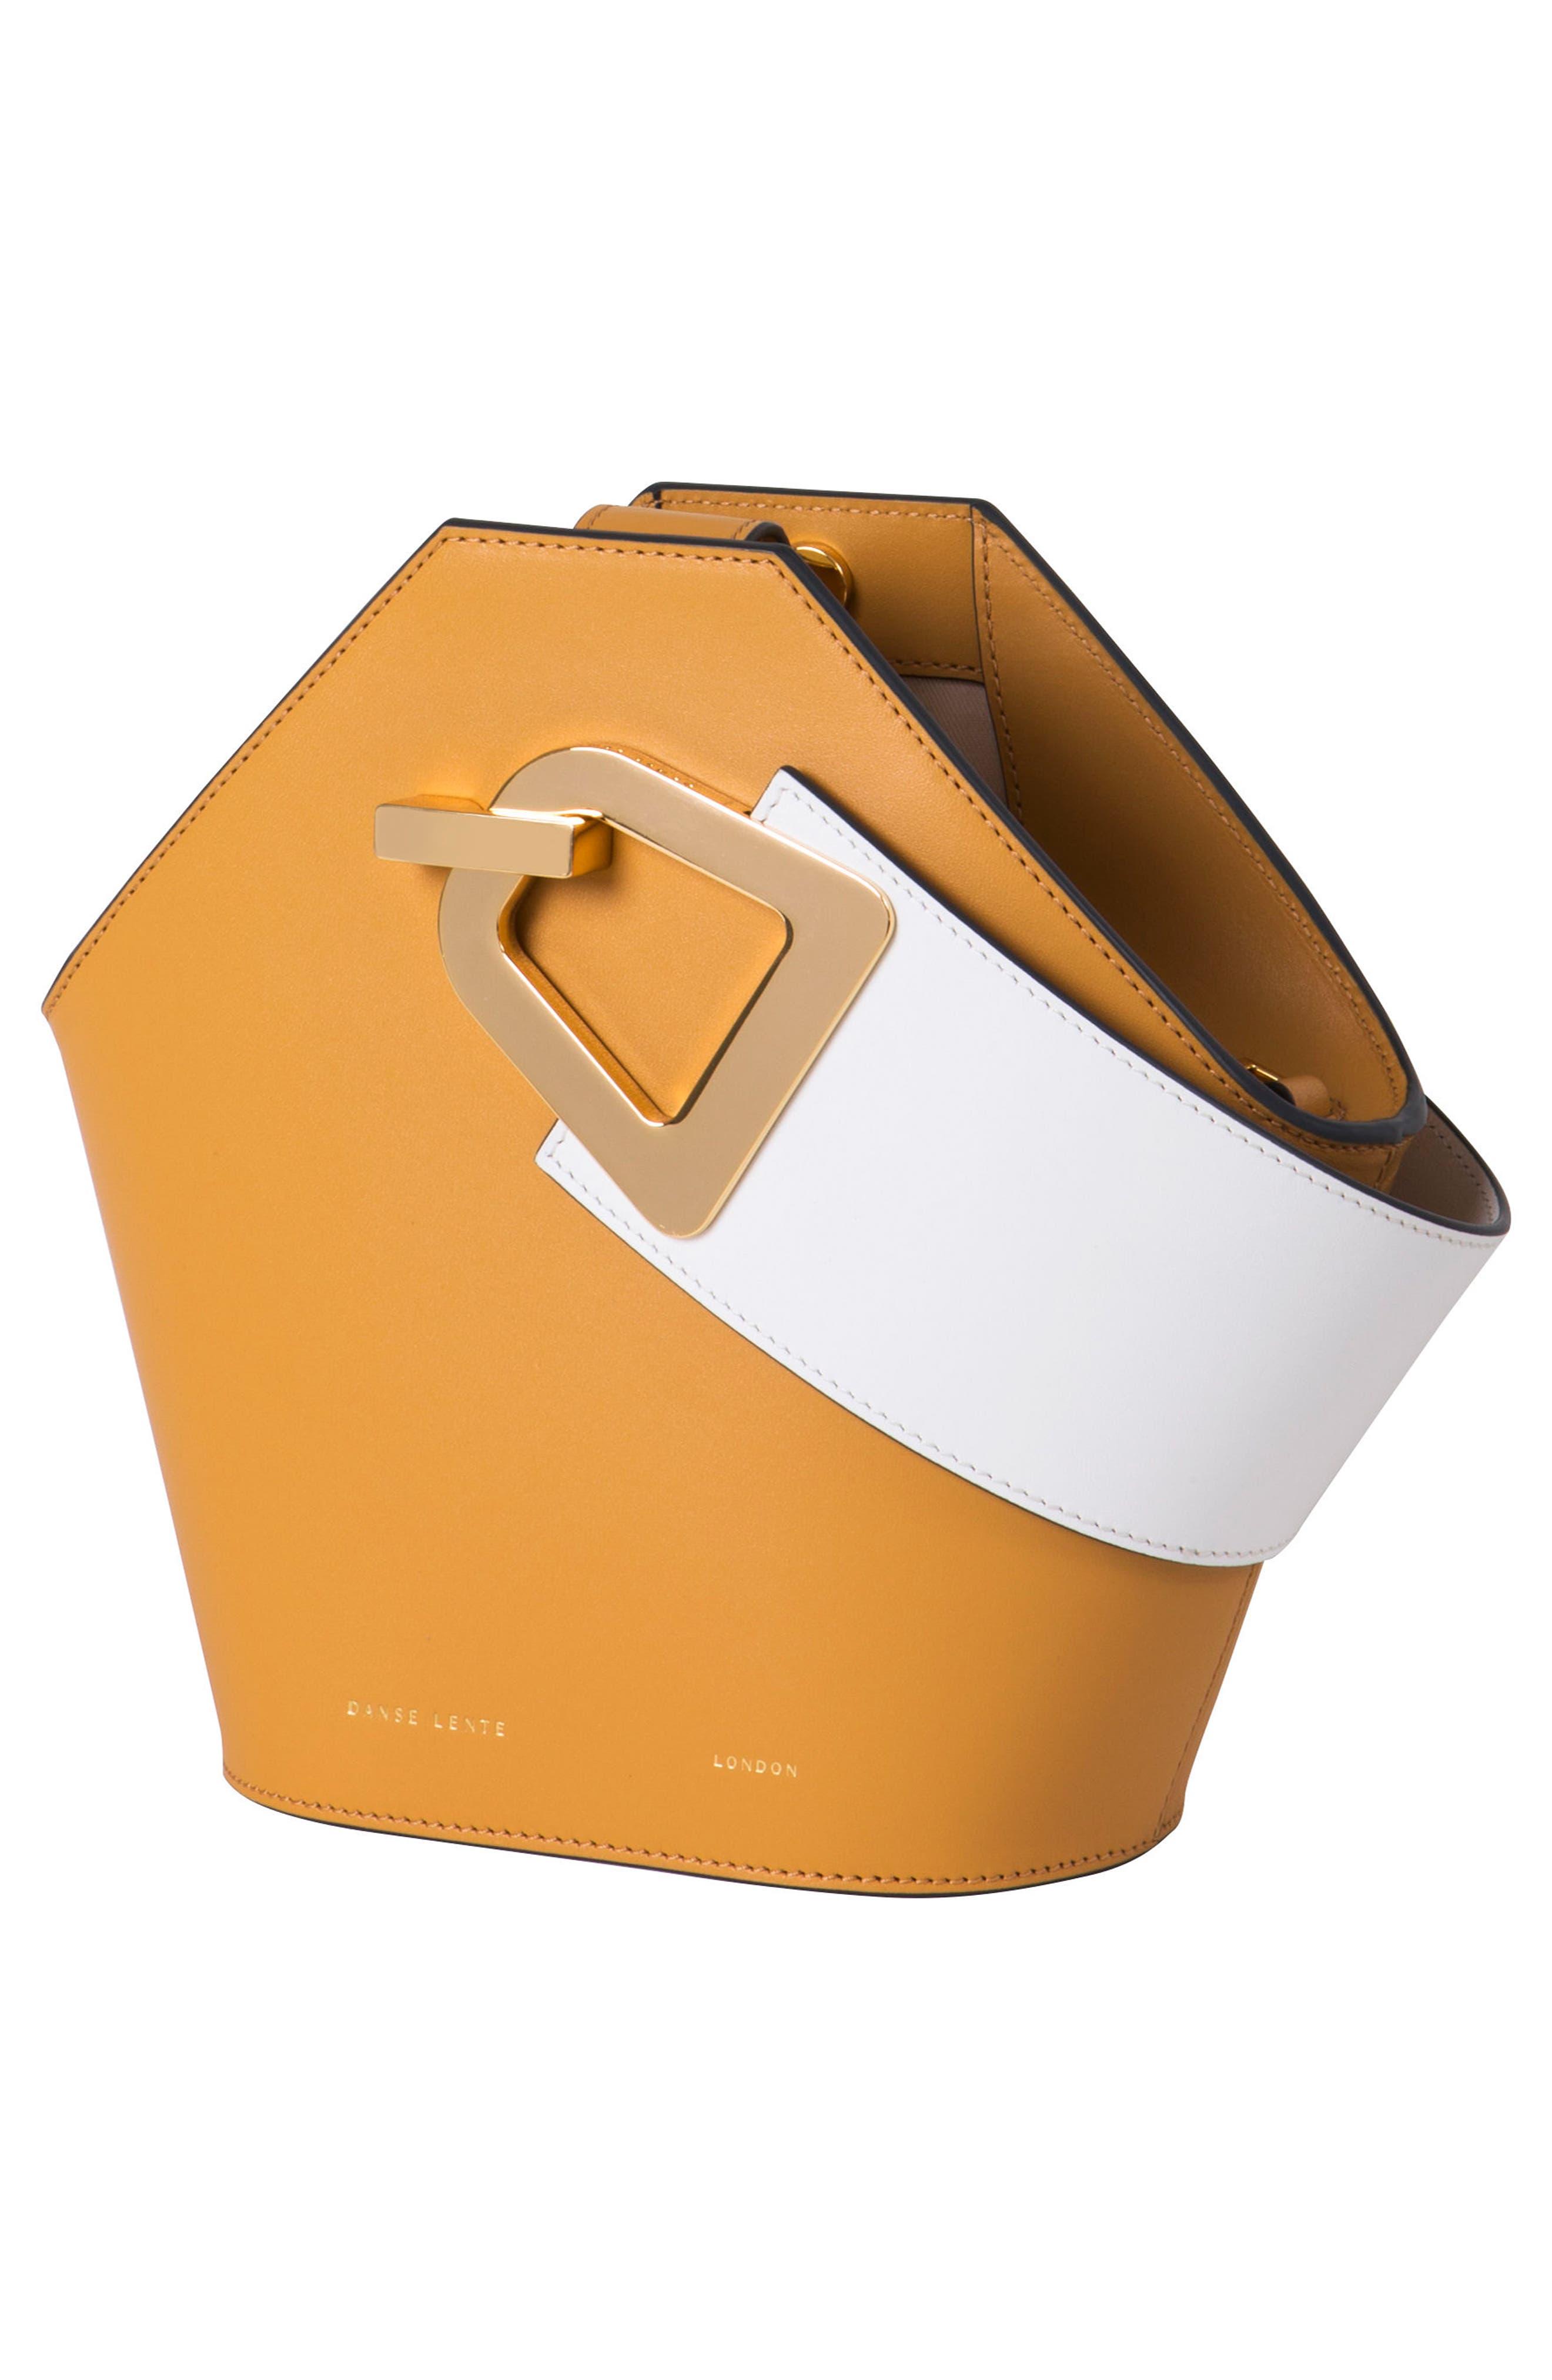 Mini Johnny Leather Bucket Bag,                             Alternate thumbnail 3, color,                             Sand